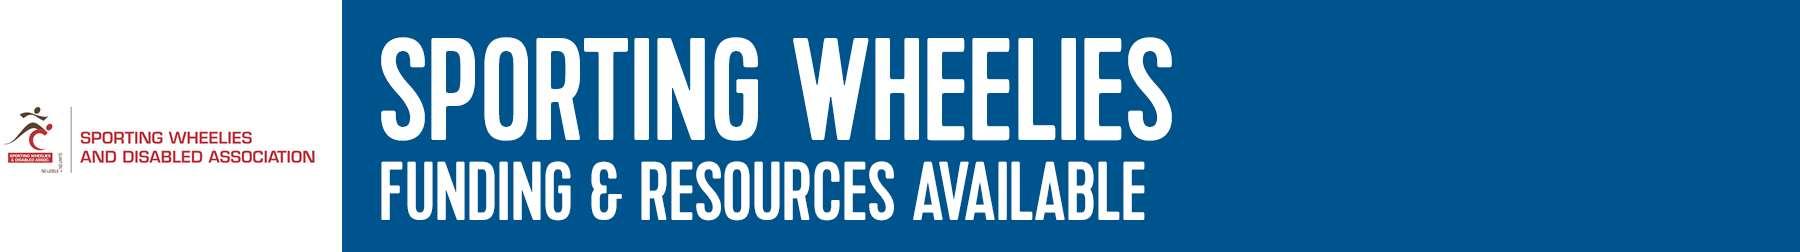 Sporting Wheelies Resources